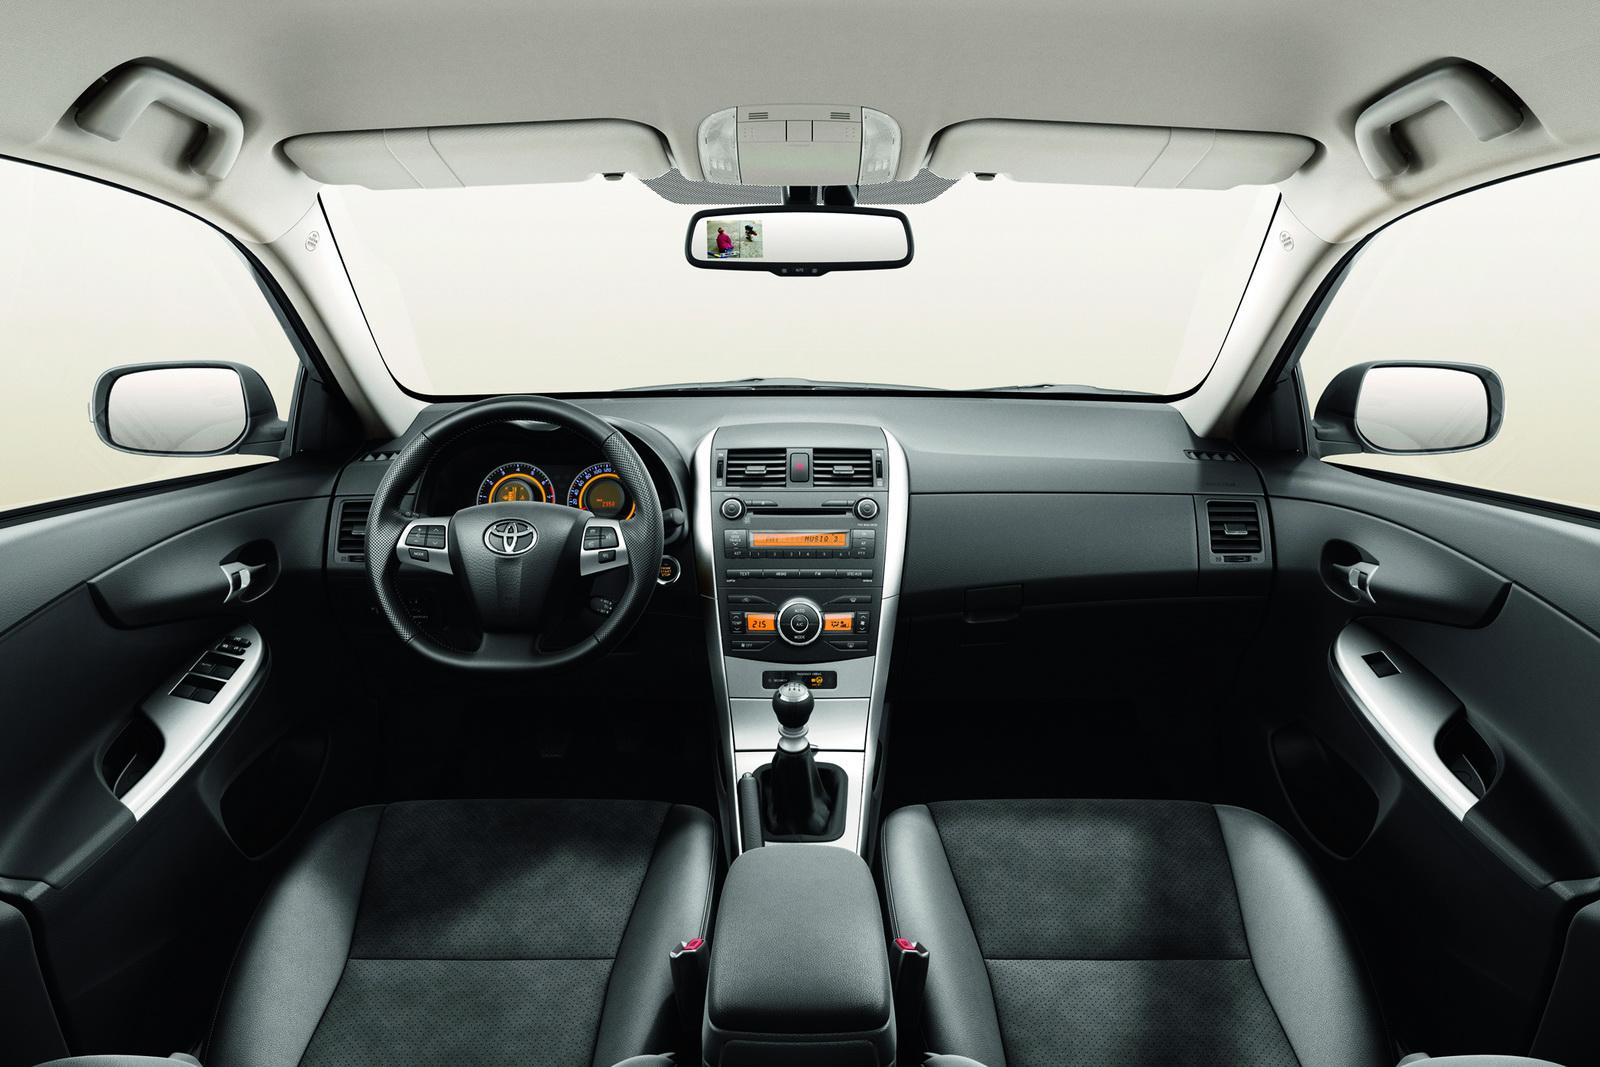 Toyota Corolla S 2010 Interior >> 2010 TOYOTA COROLLA - Image #19